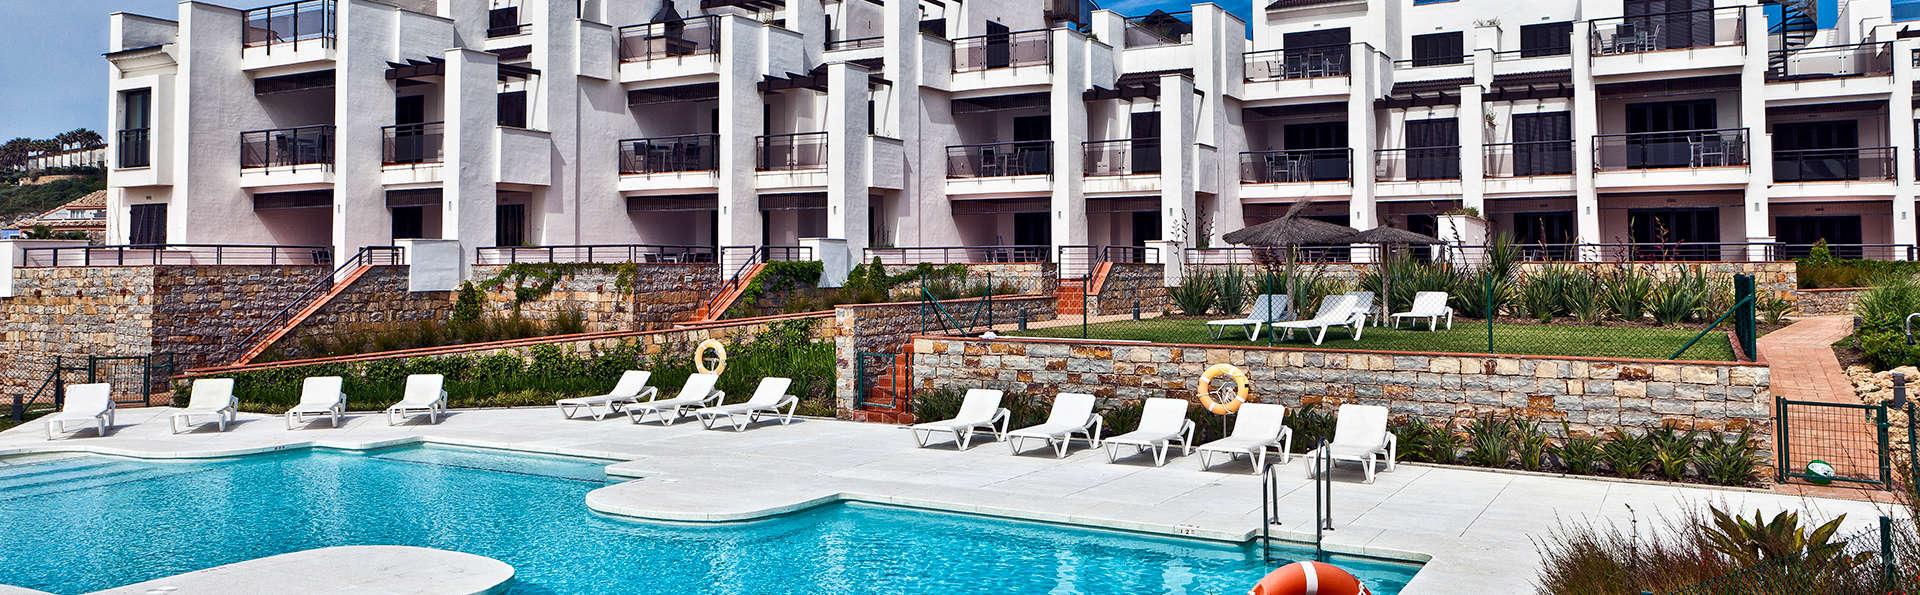 Casares del Mar Luxury Apartments - Edit_Pool4.jpg